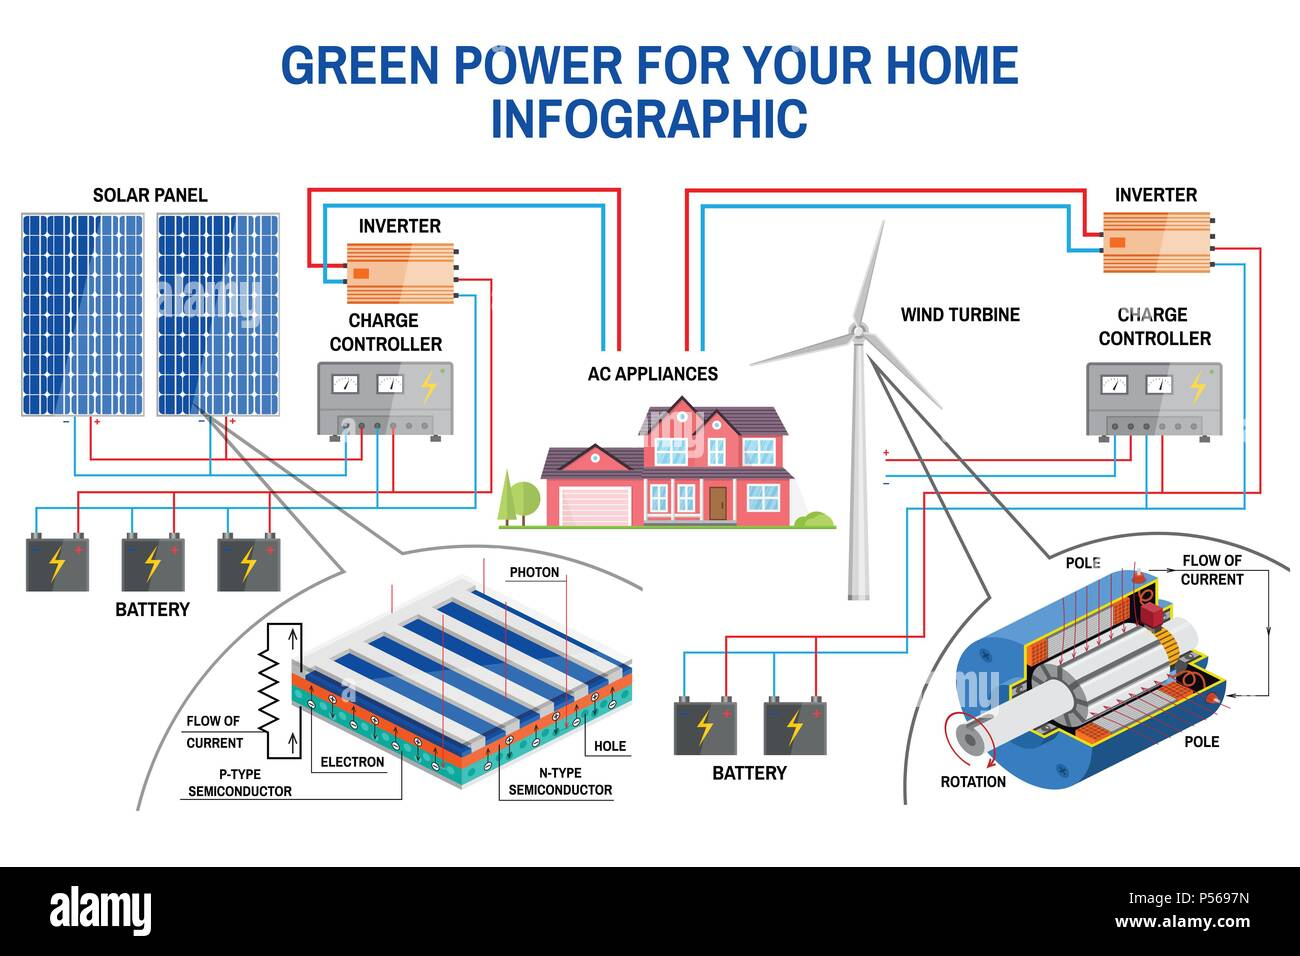 Strange Solar Panel And Wind Power Generation System For Home Infographic Wiring Cloud Mangdienstapotheekhoekschewaardnl